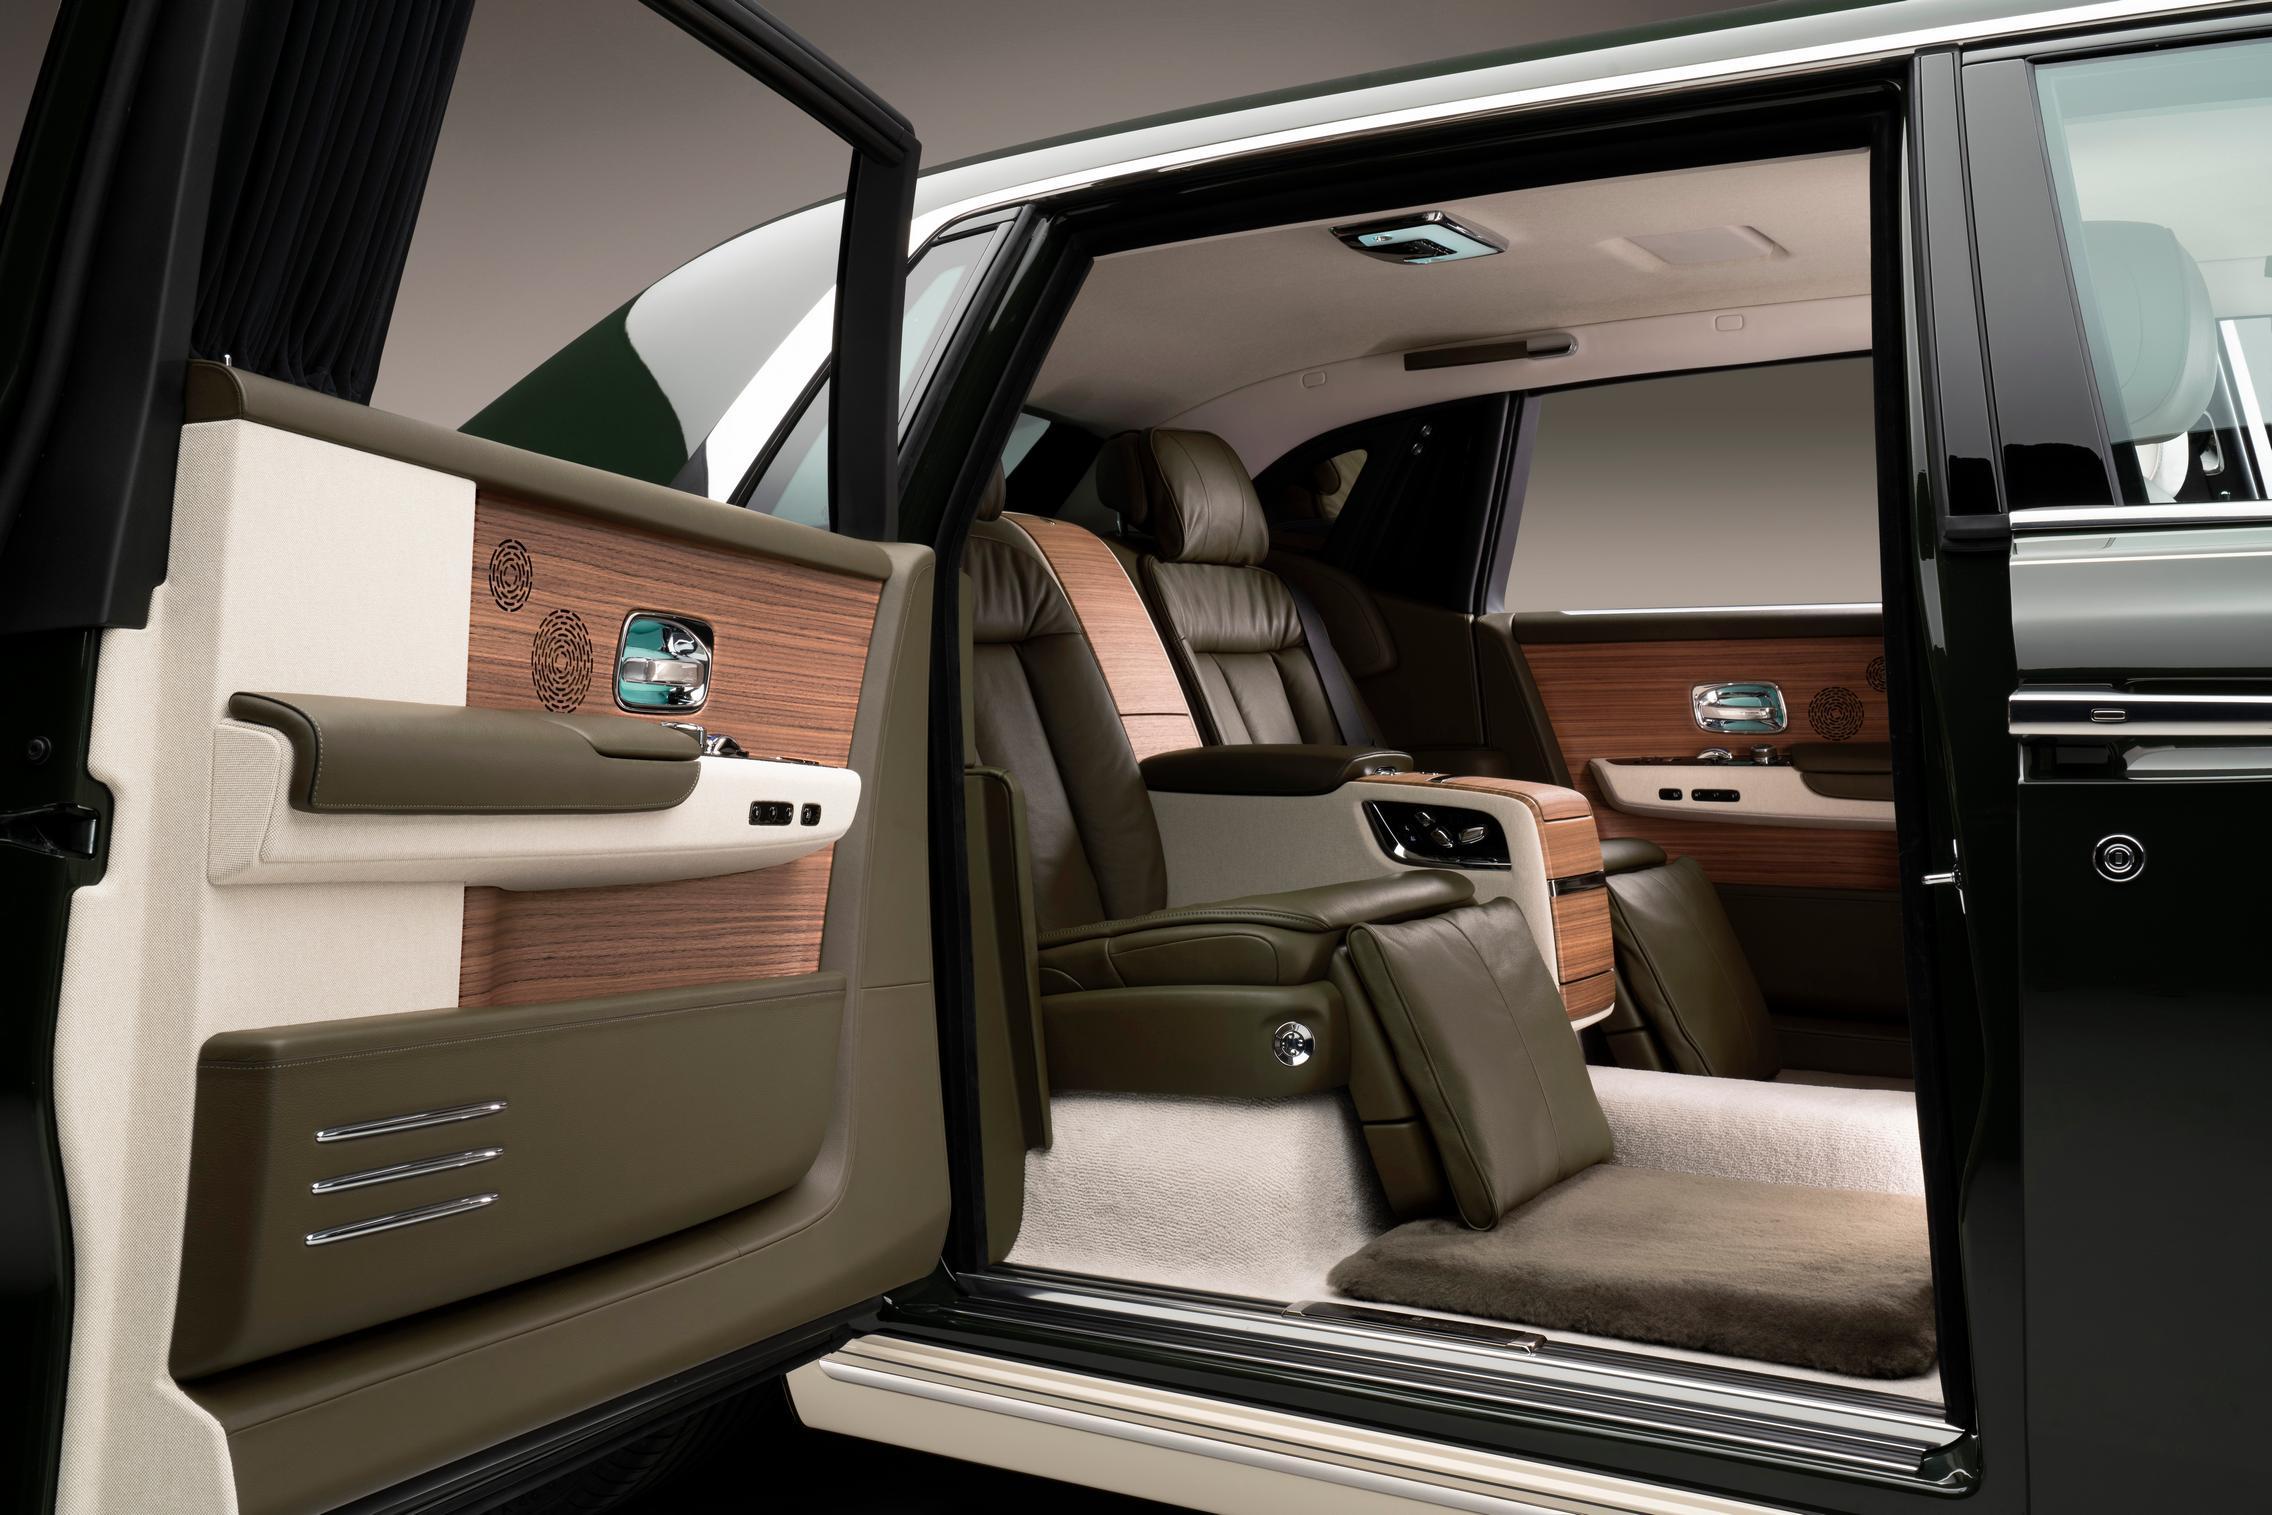 Hermes Rolls-Royce Phantom rear seats